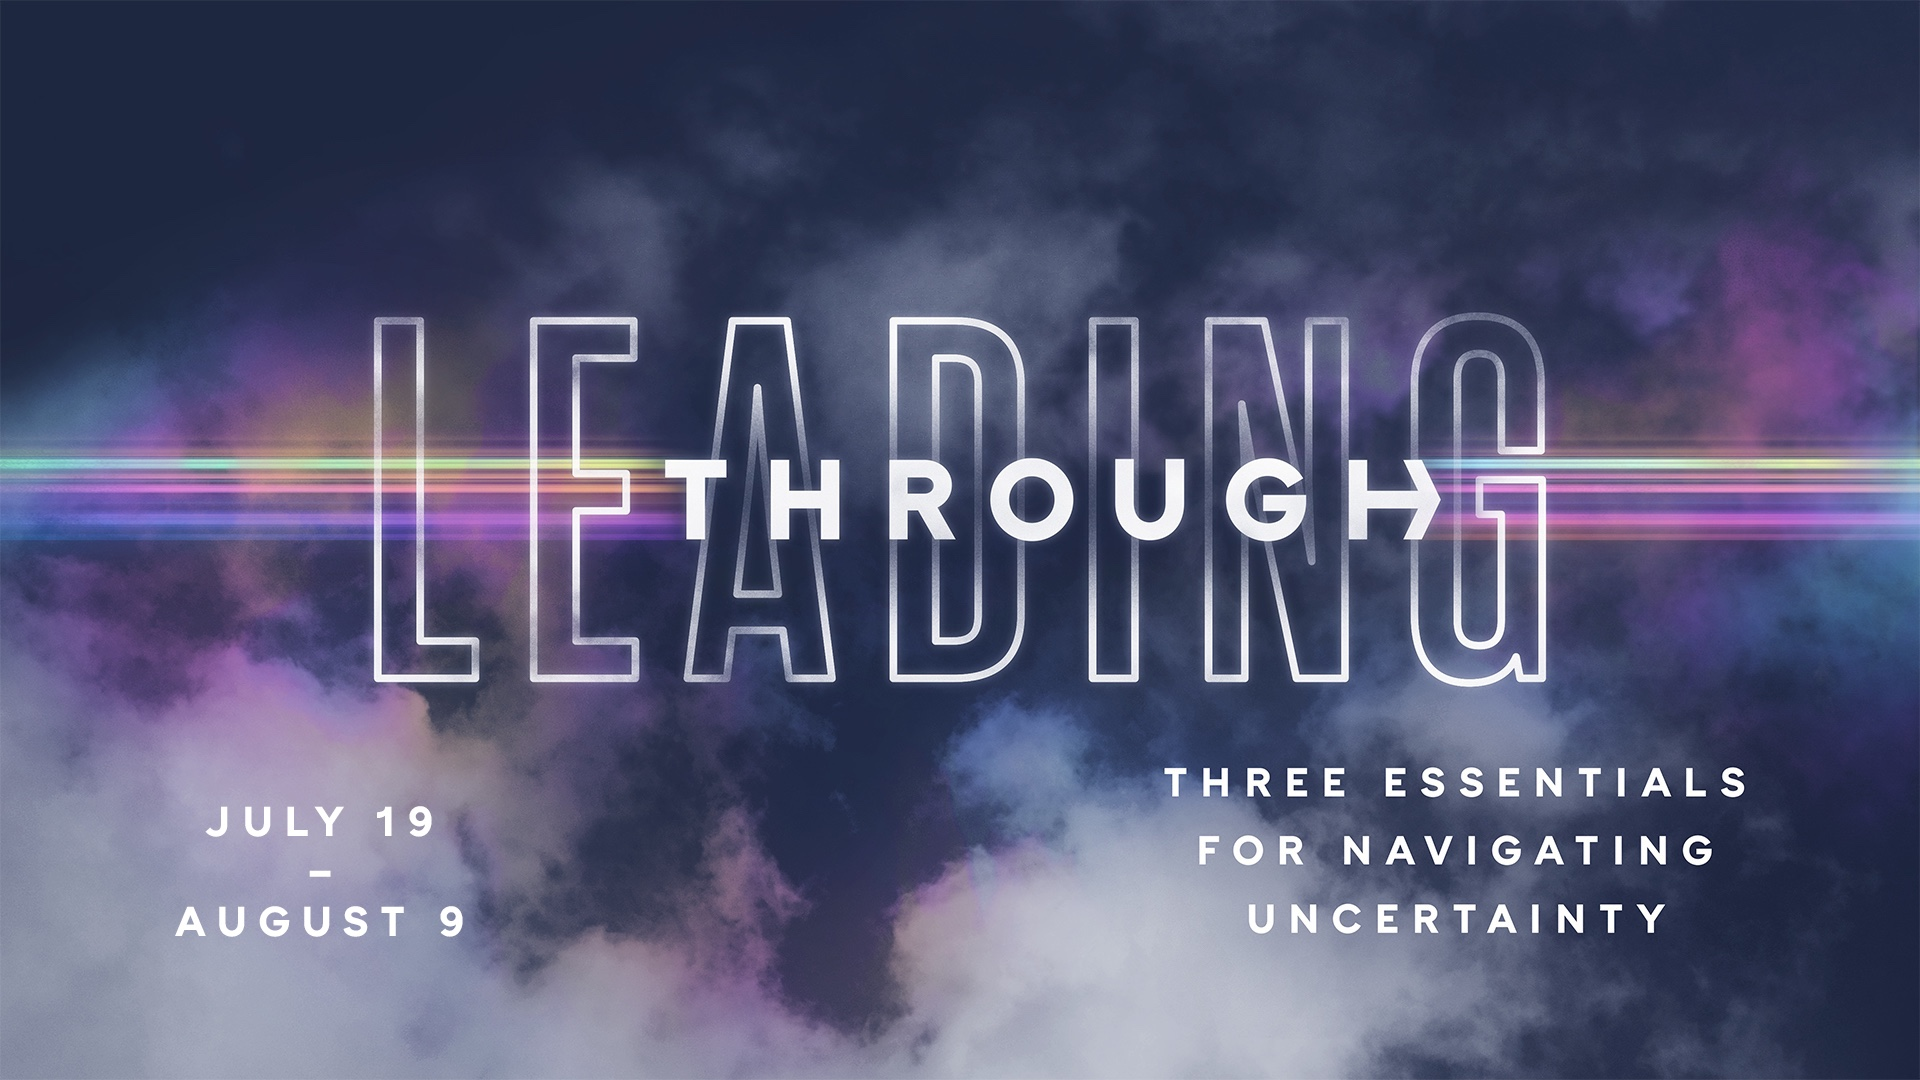 Leading Through